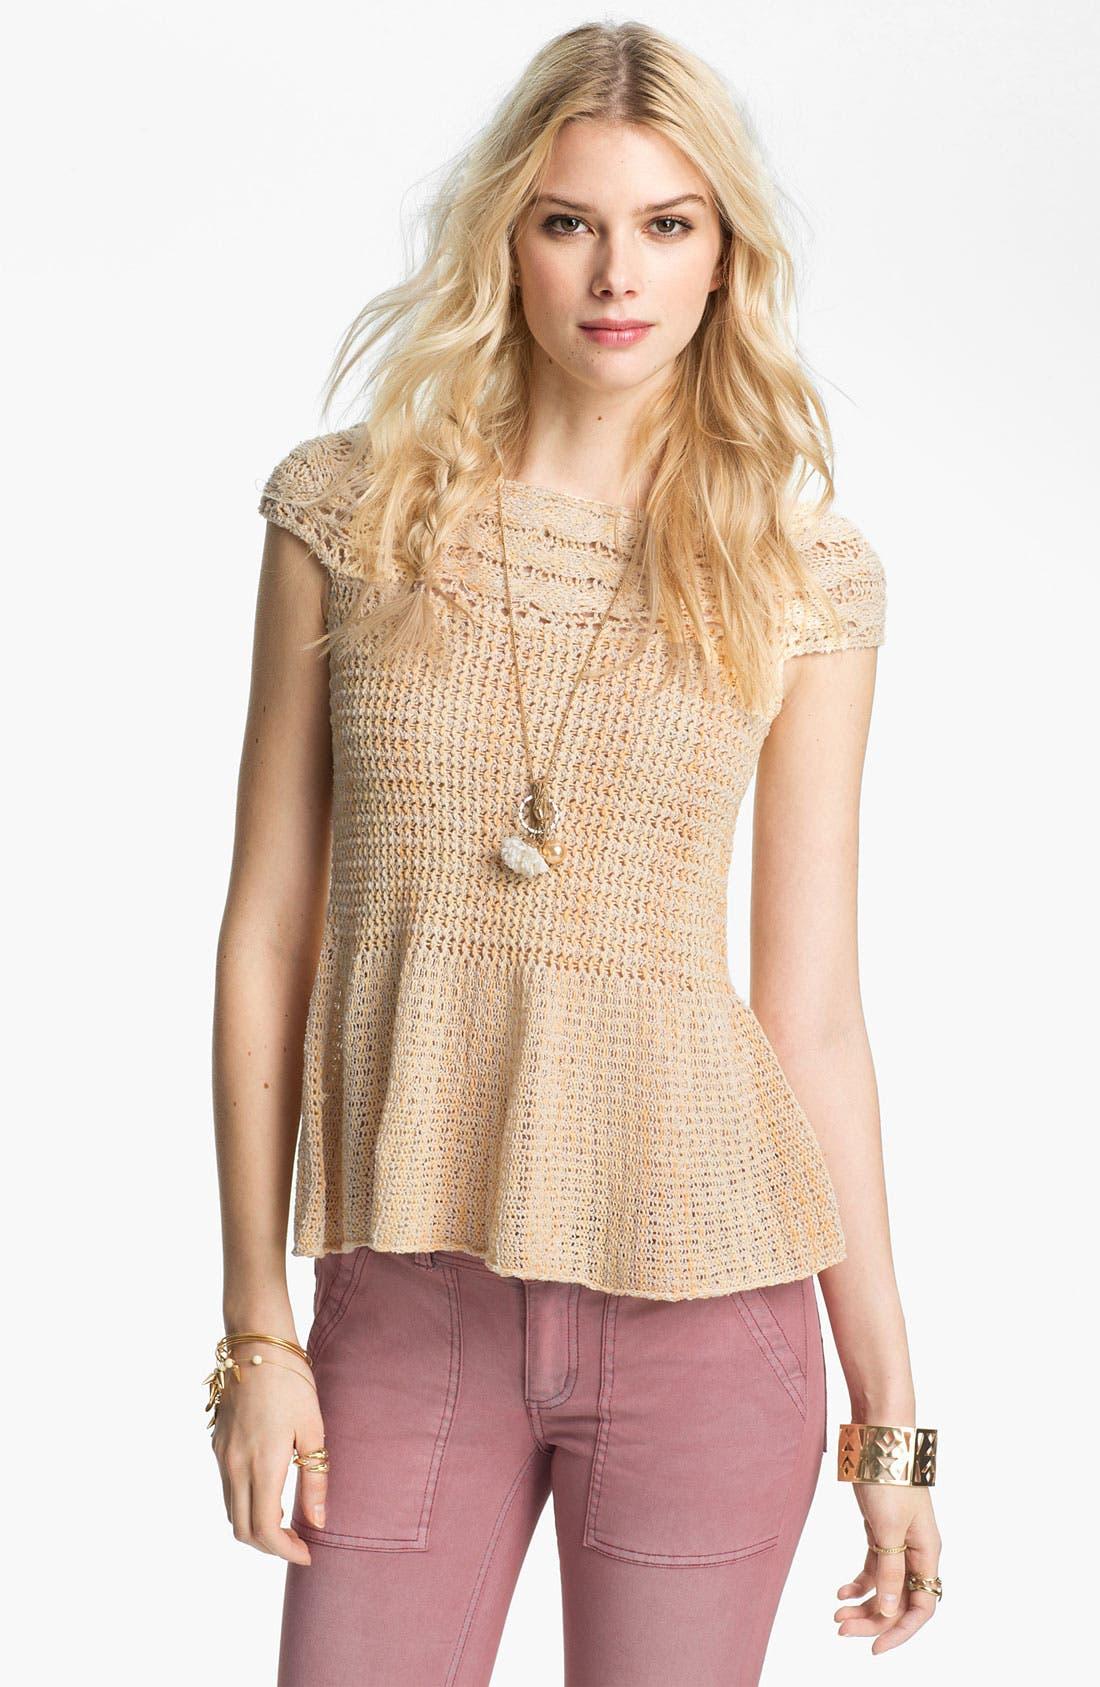 Main Image - Free People 'Lollipop' Crochet Peplum Top